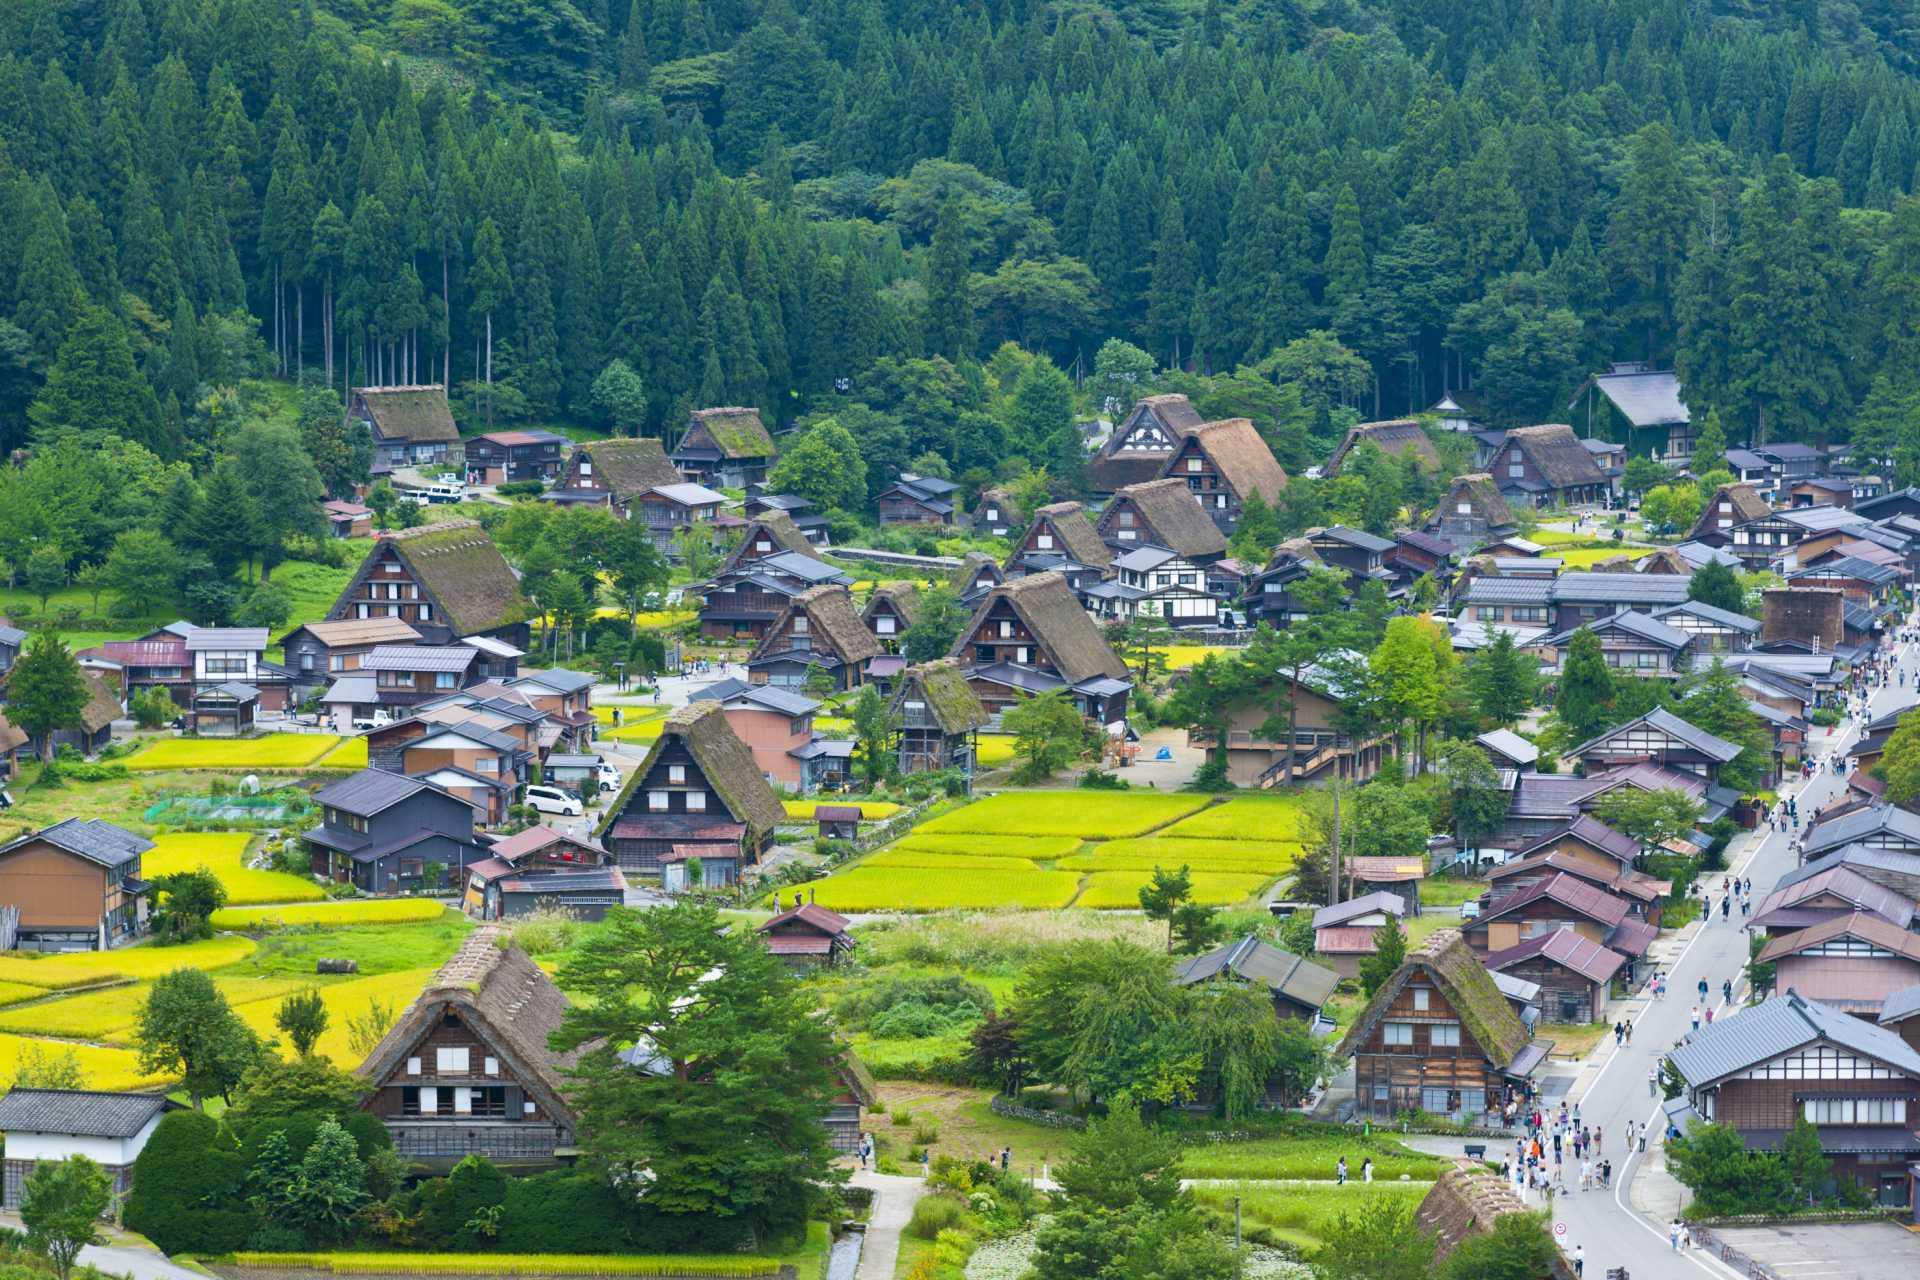 Shirakawa-go (Historic Village), World Cultural Heritage, Group of Traditional Buildings, Tenshukaku Observatory Deck, Nature